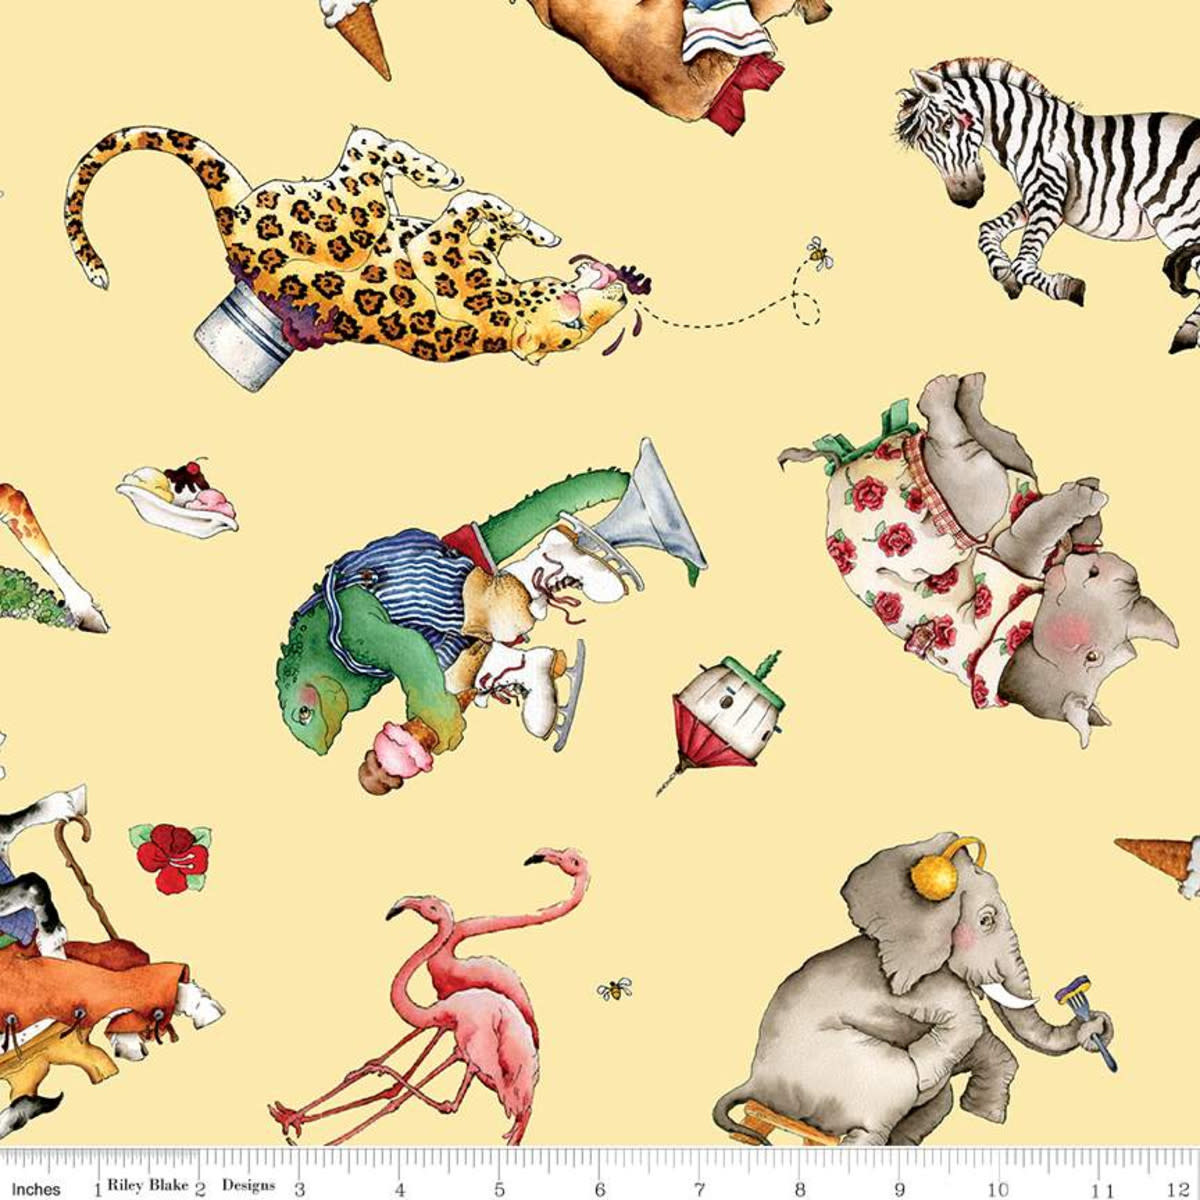 RILEY BLAKE DESIGNS Hungry Animal Alphabet, Tossed Animals, Yellow per cm or $22/m